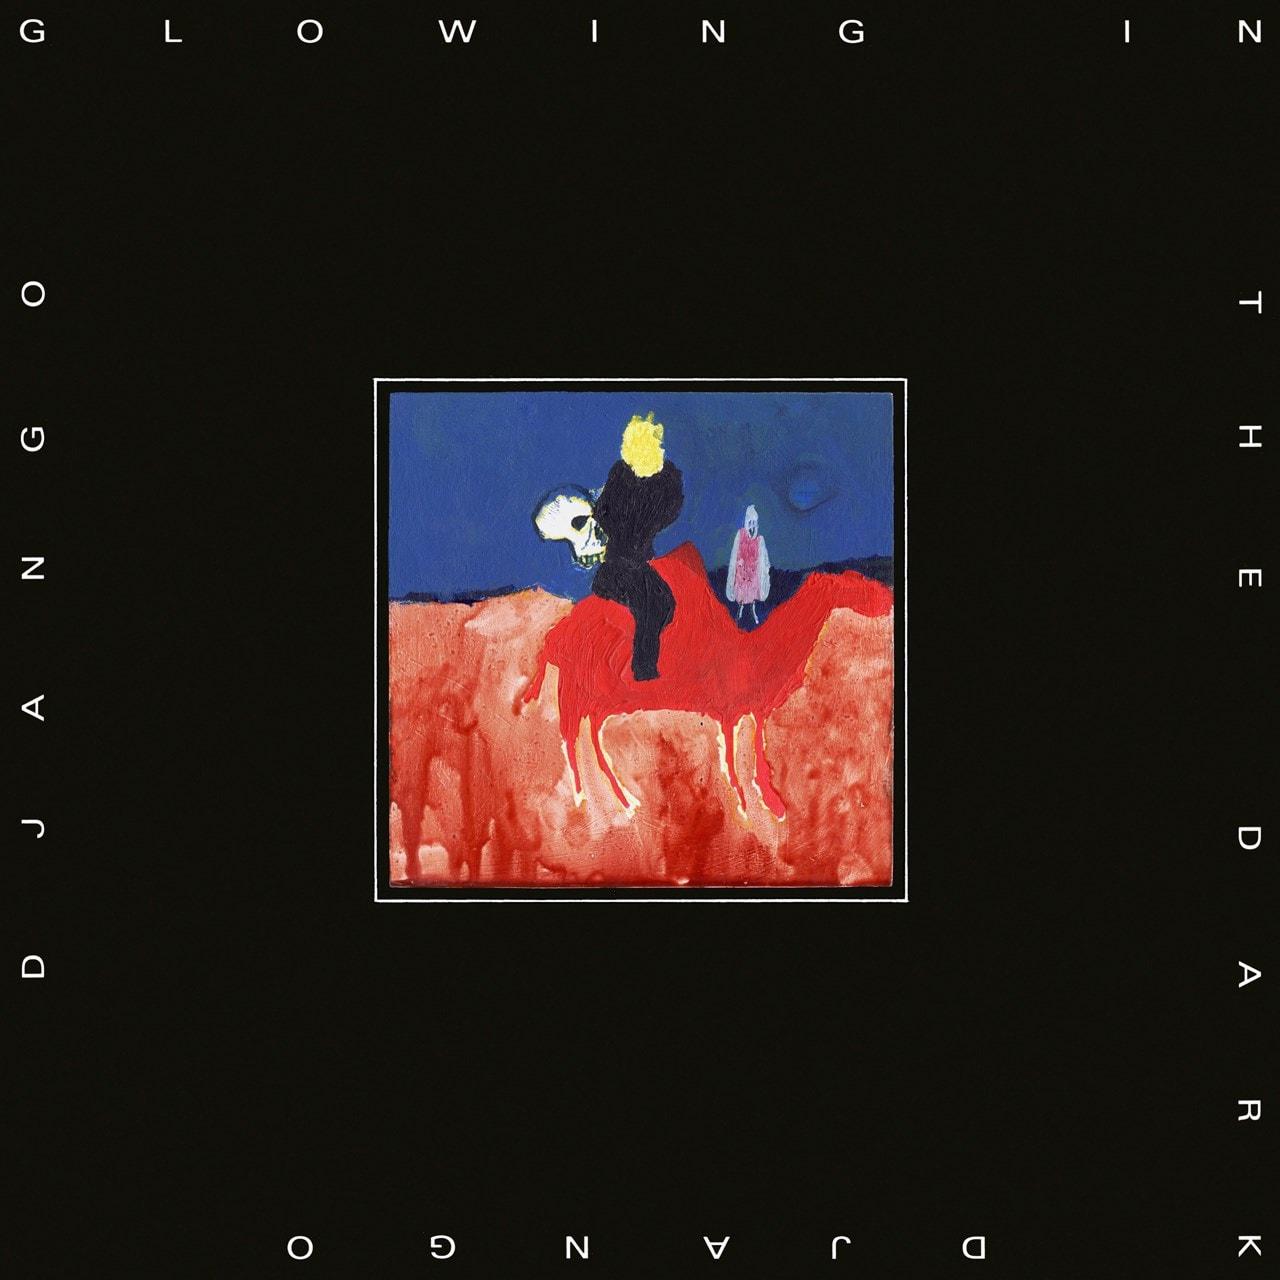 django django glowing in the dark new album stream track by track